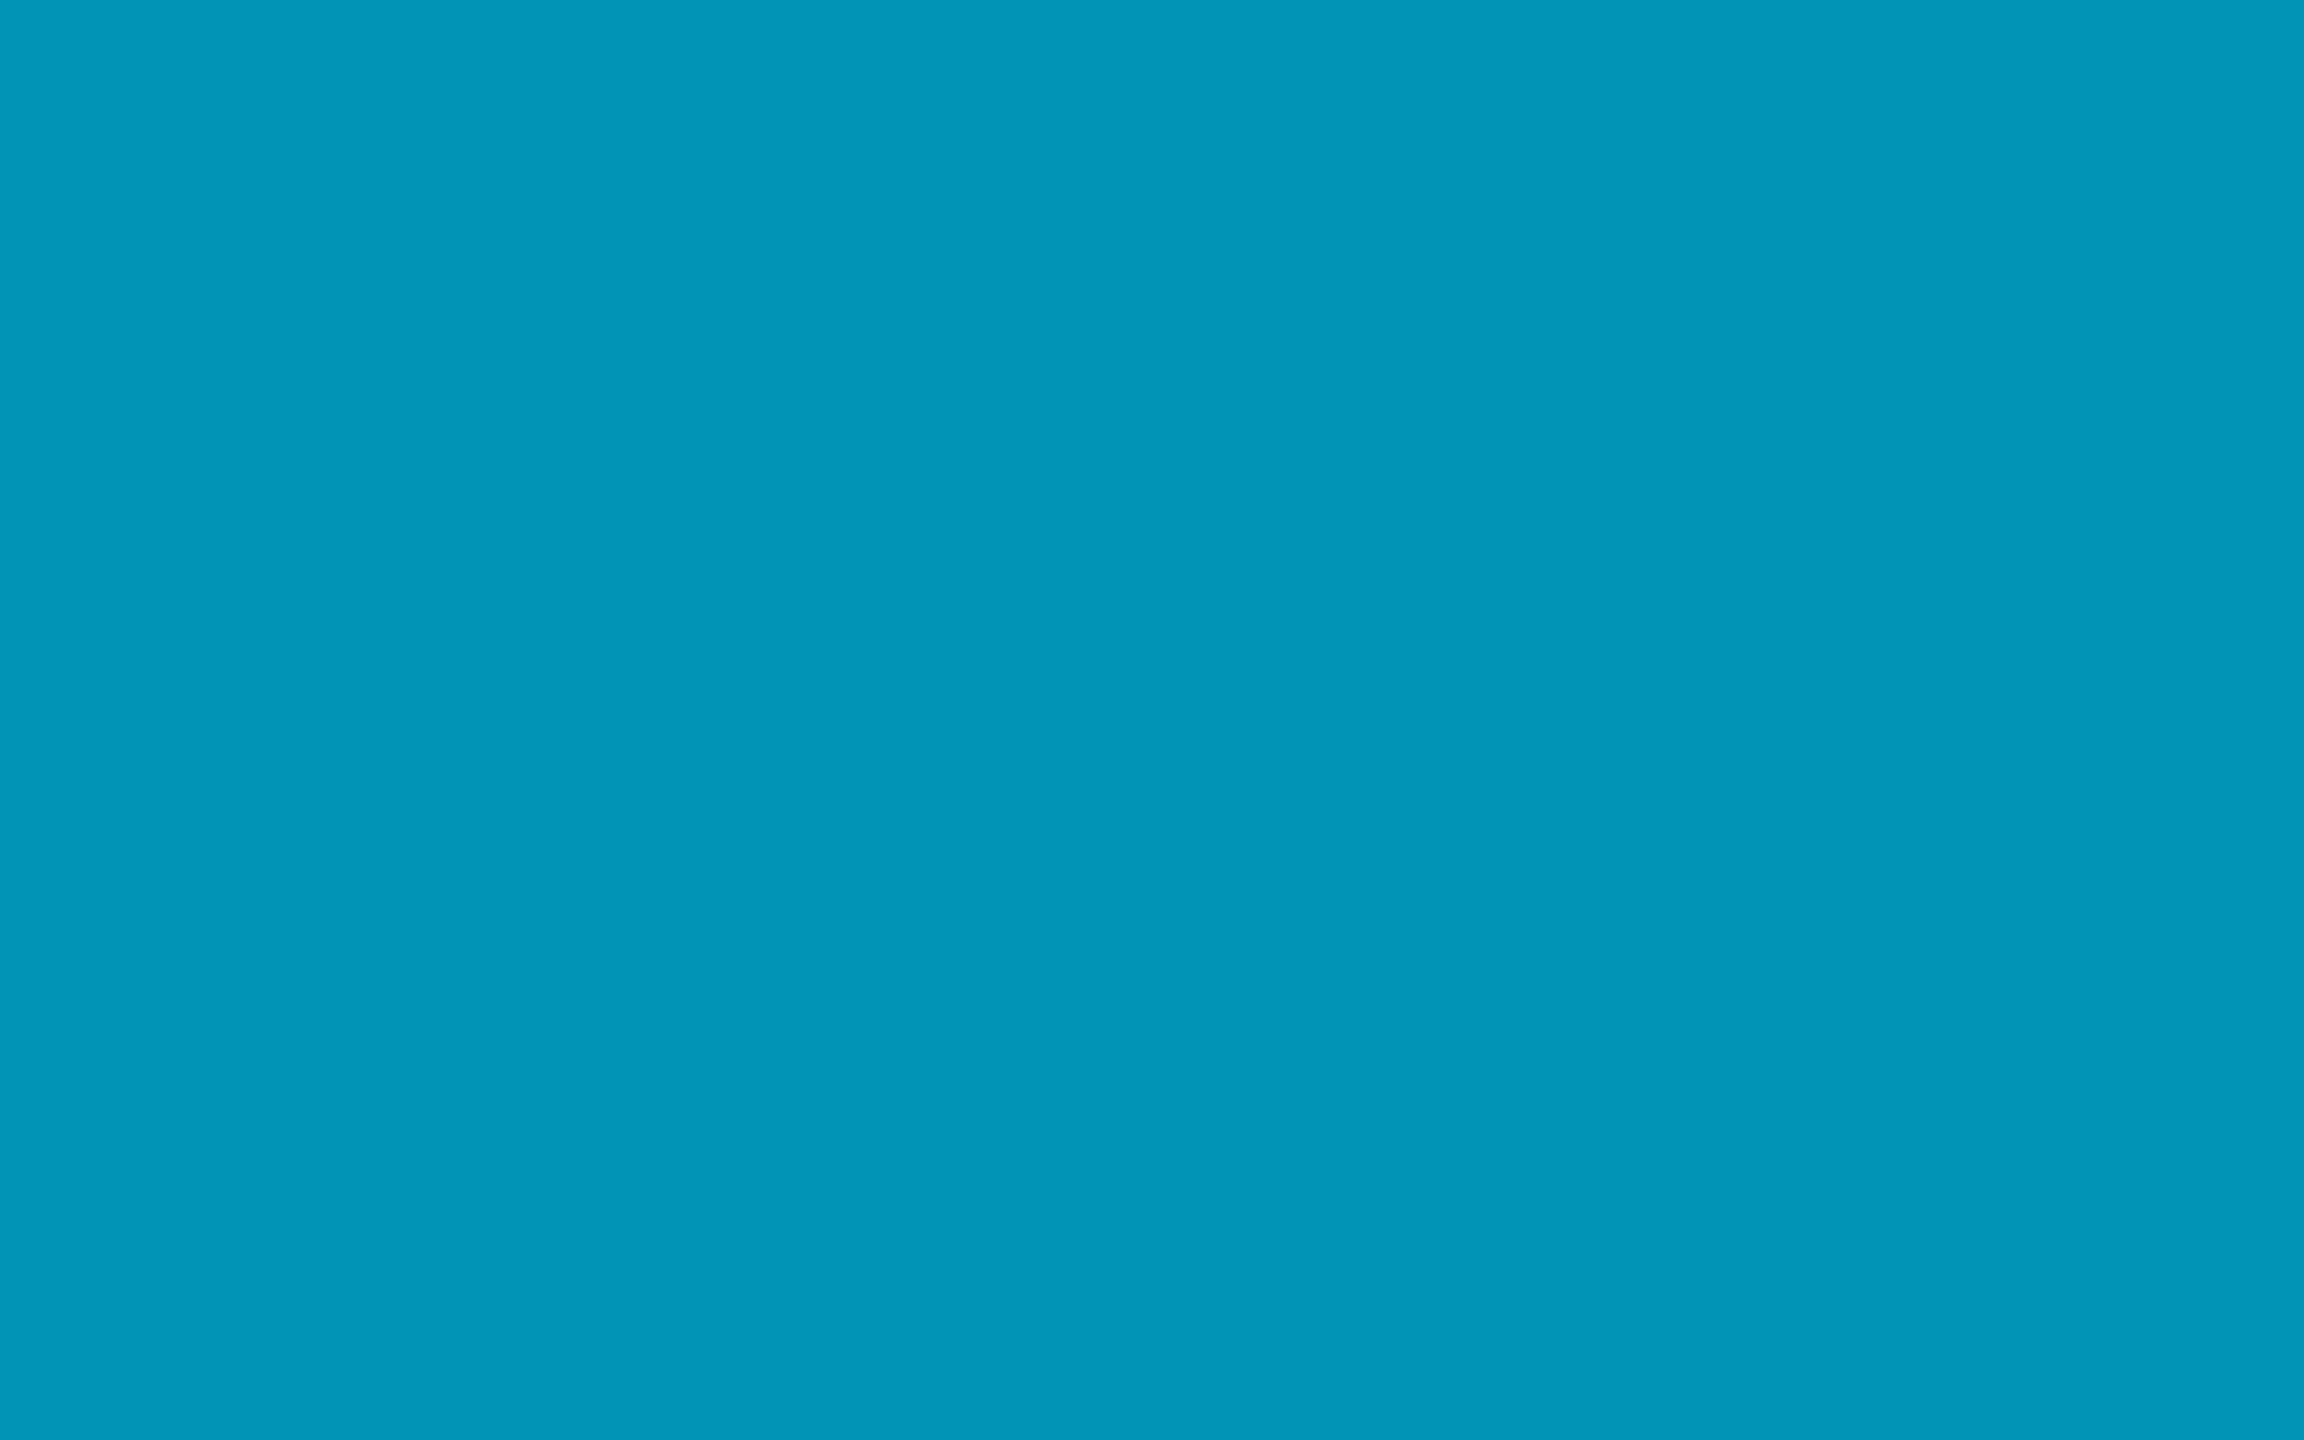 2304x1440 Bondi Blue Solid Color Background